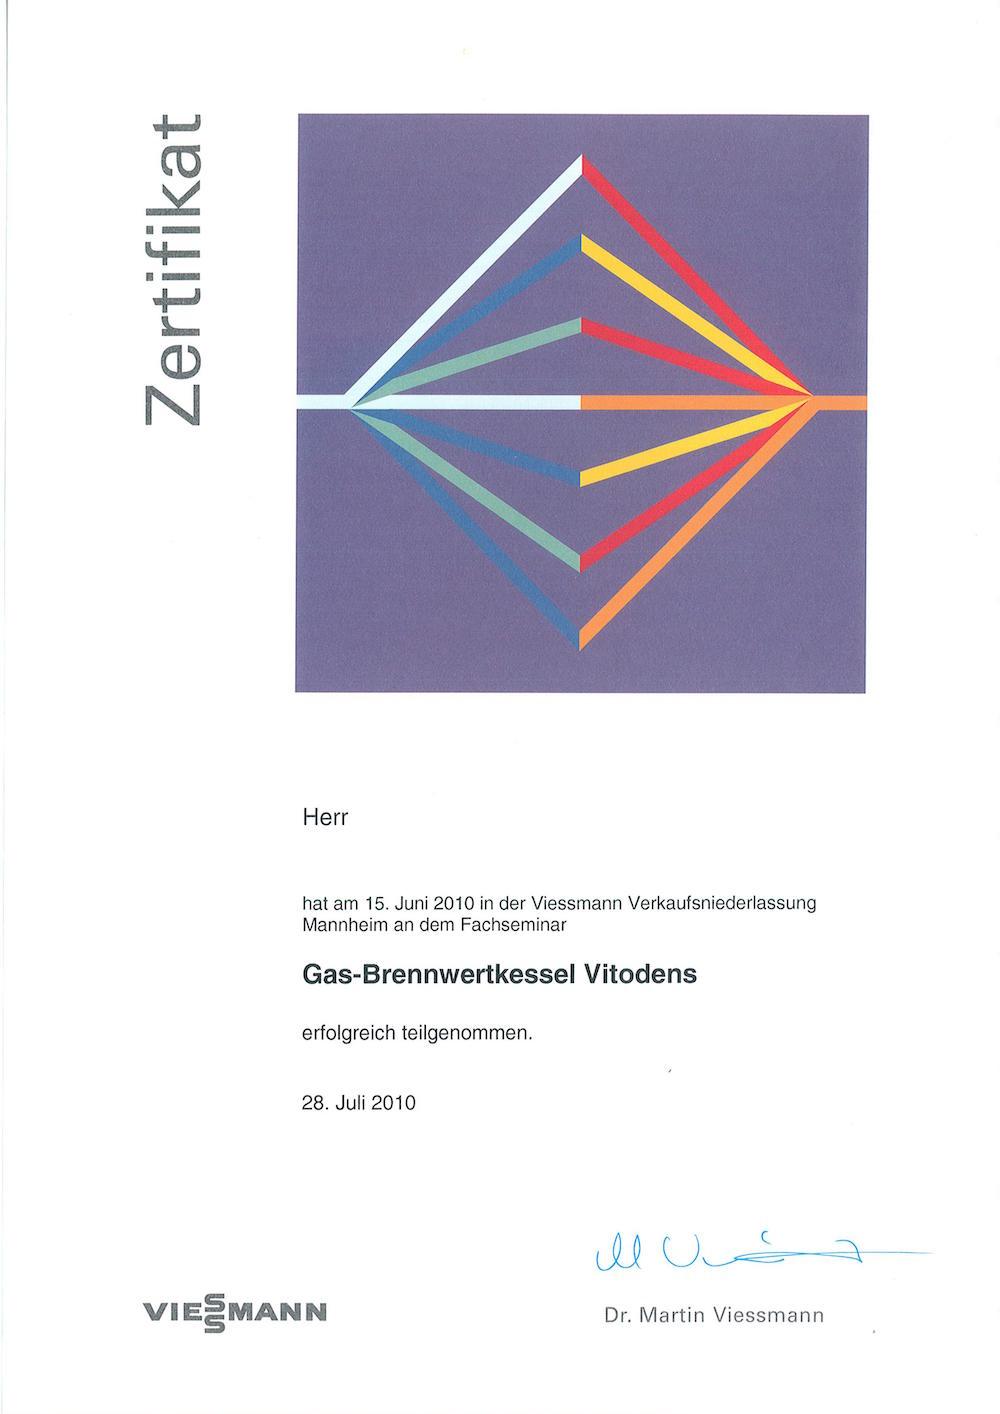 Gas-Brennwertkessel Vitodens